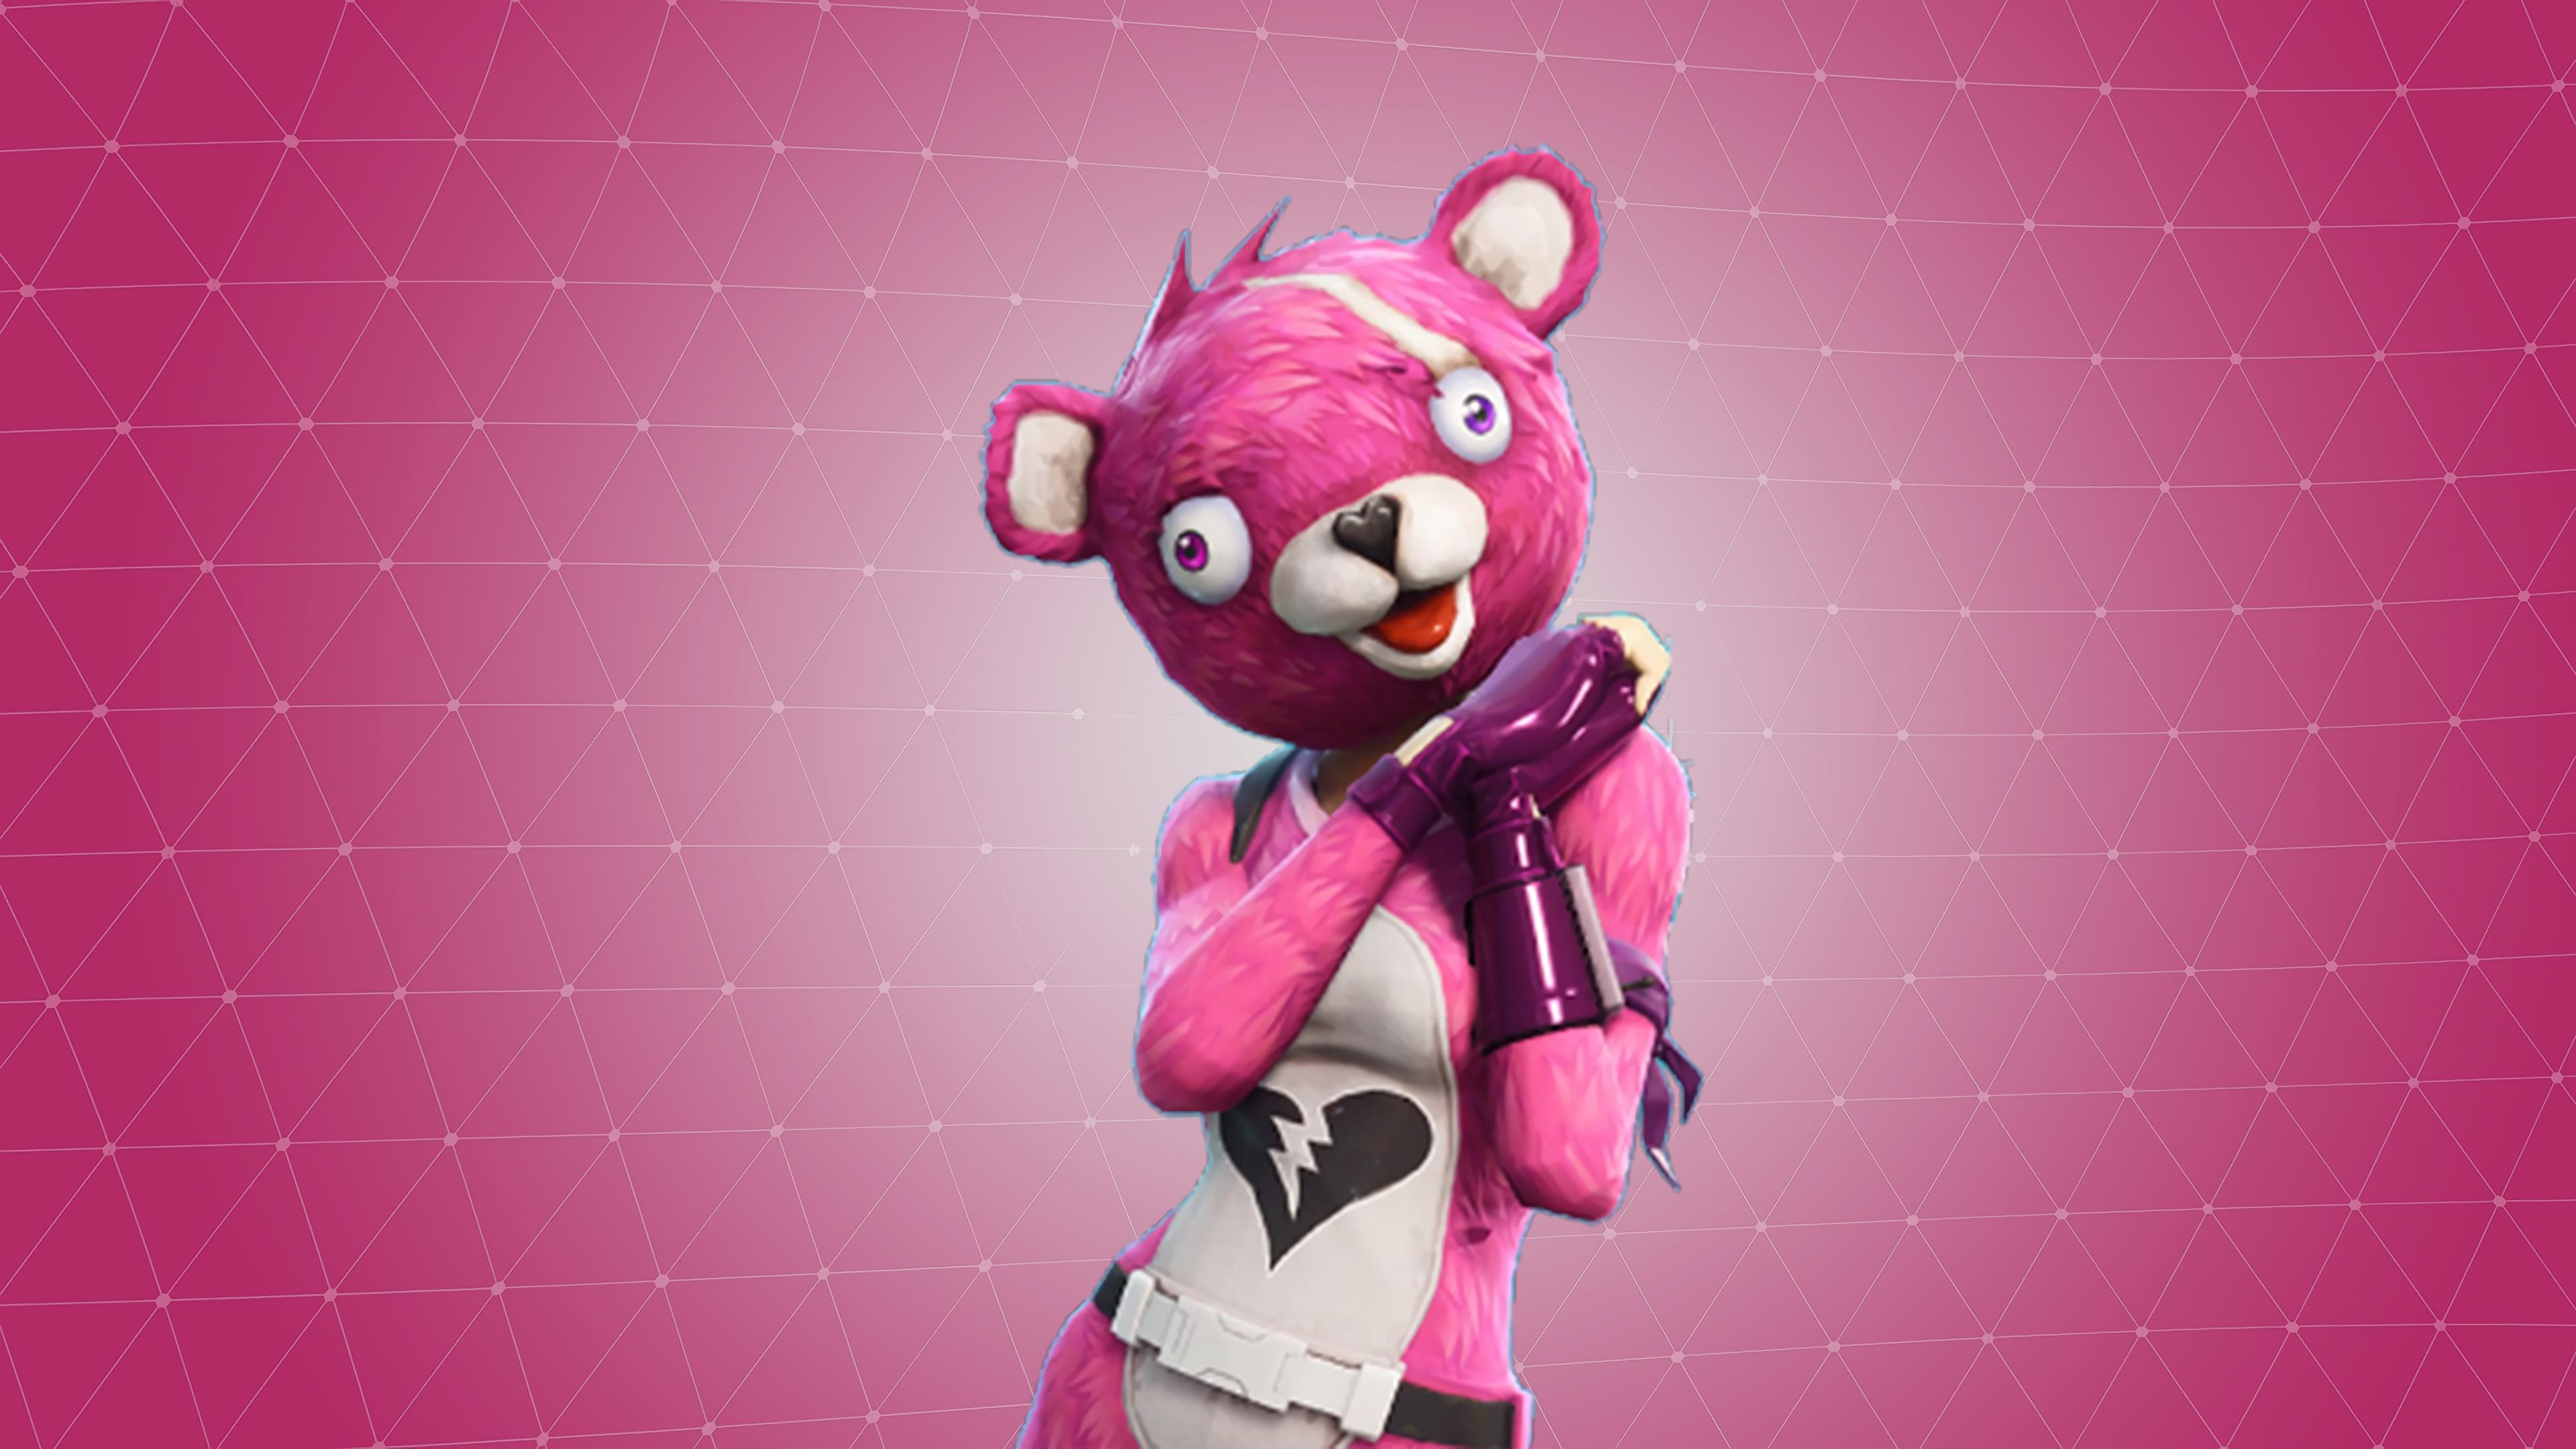 cuddle bear team leader